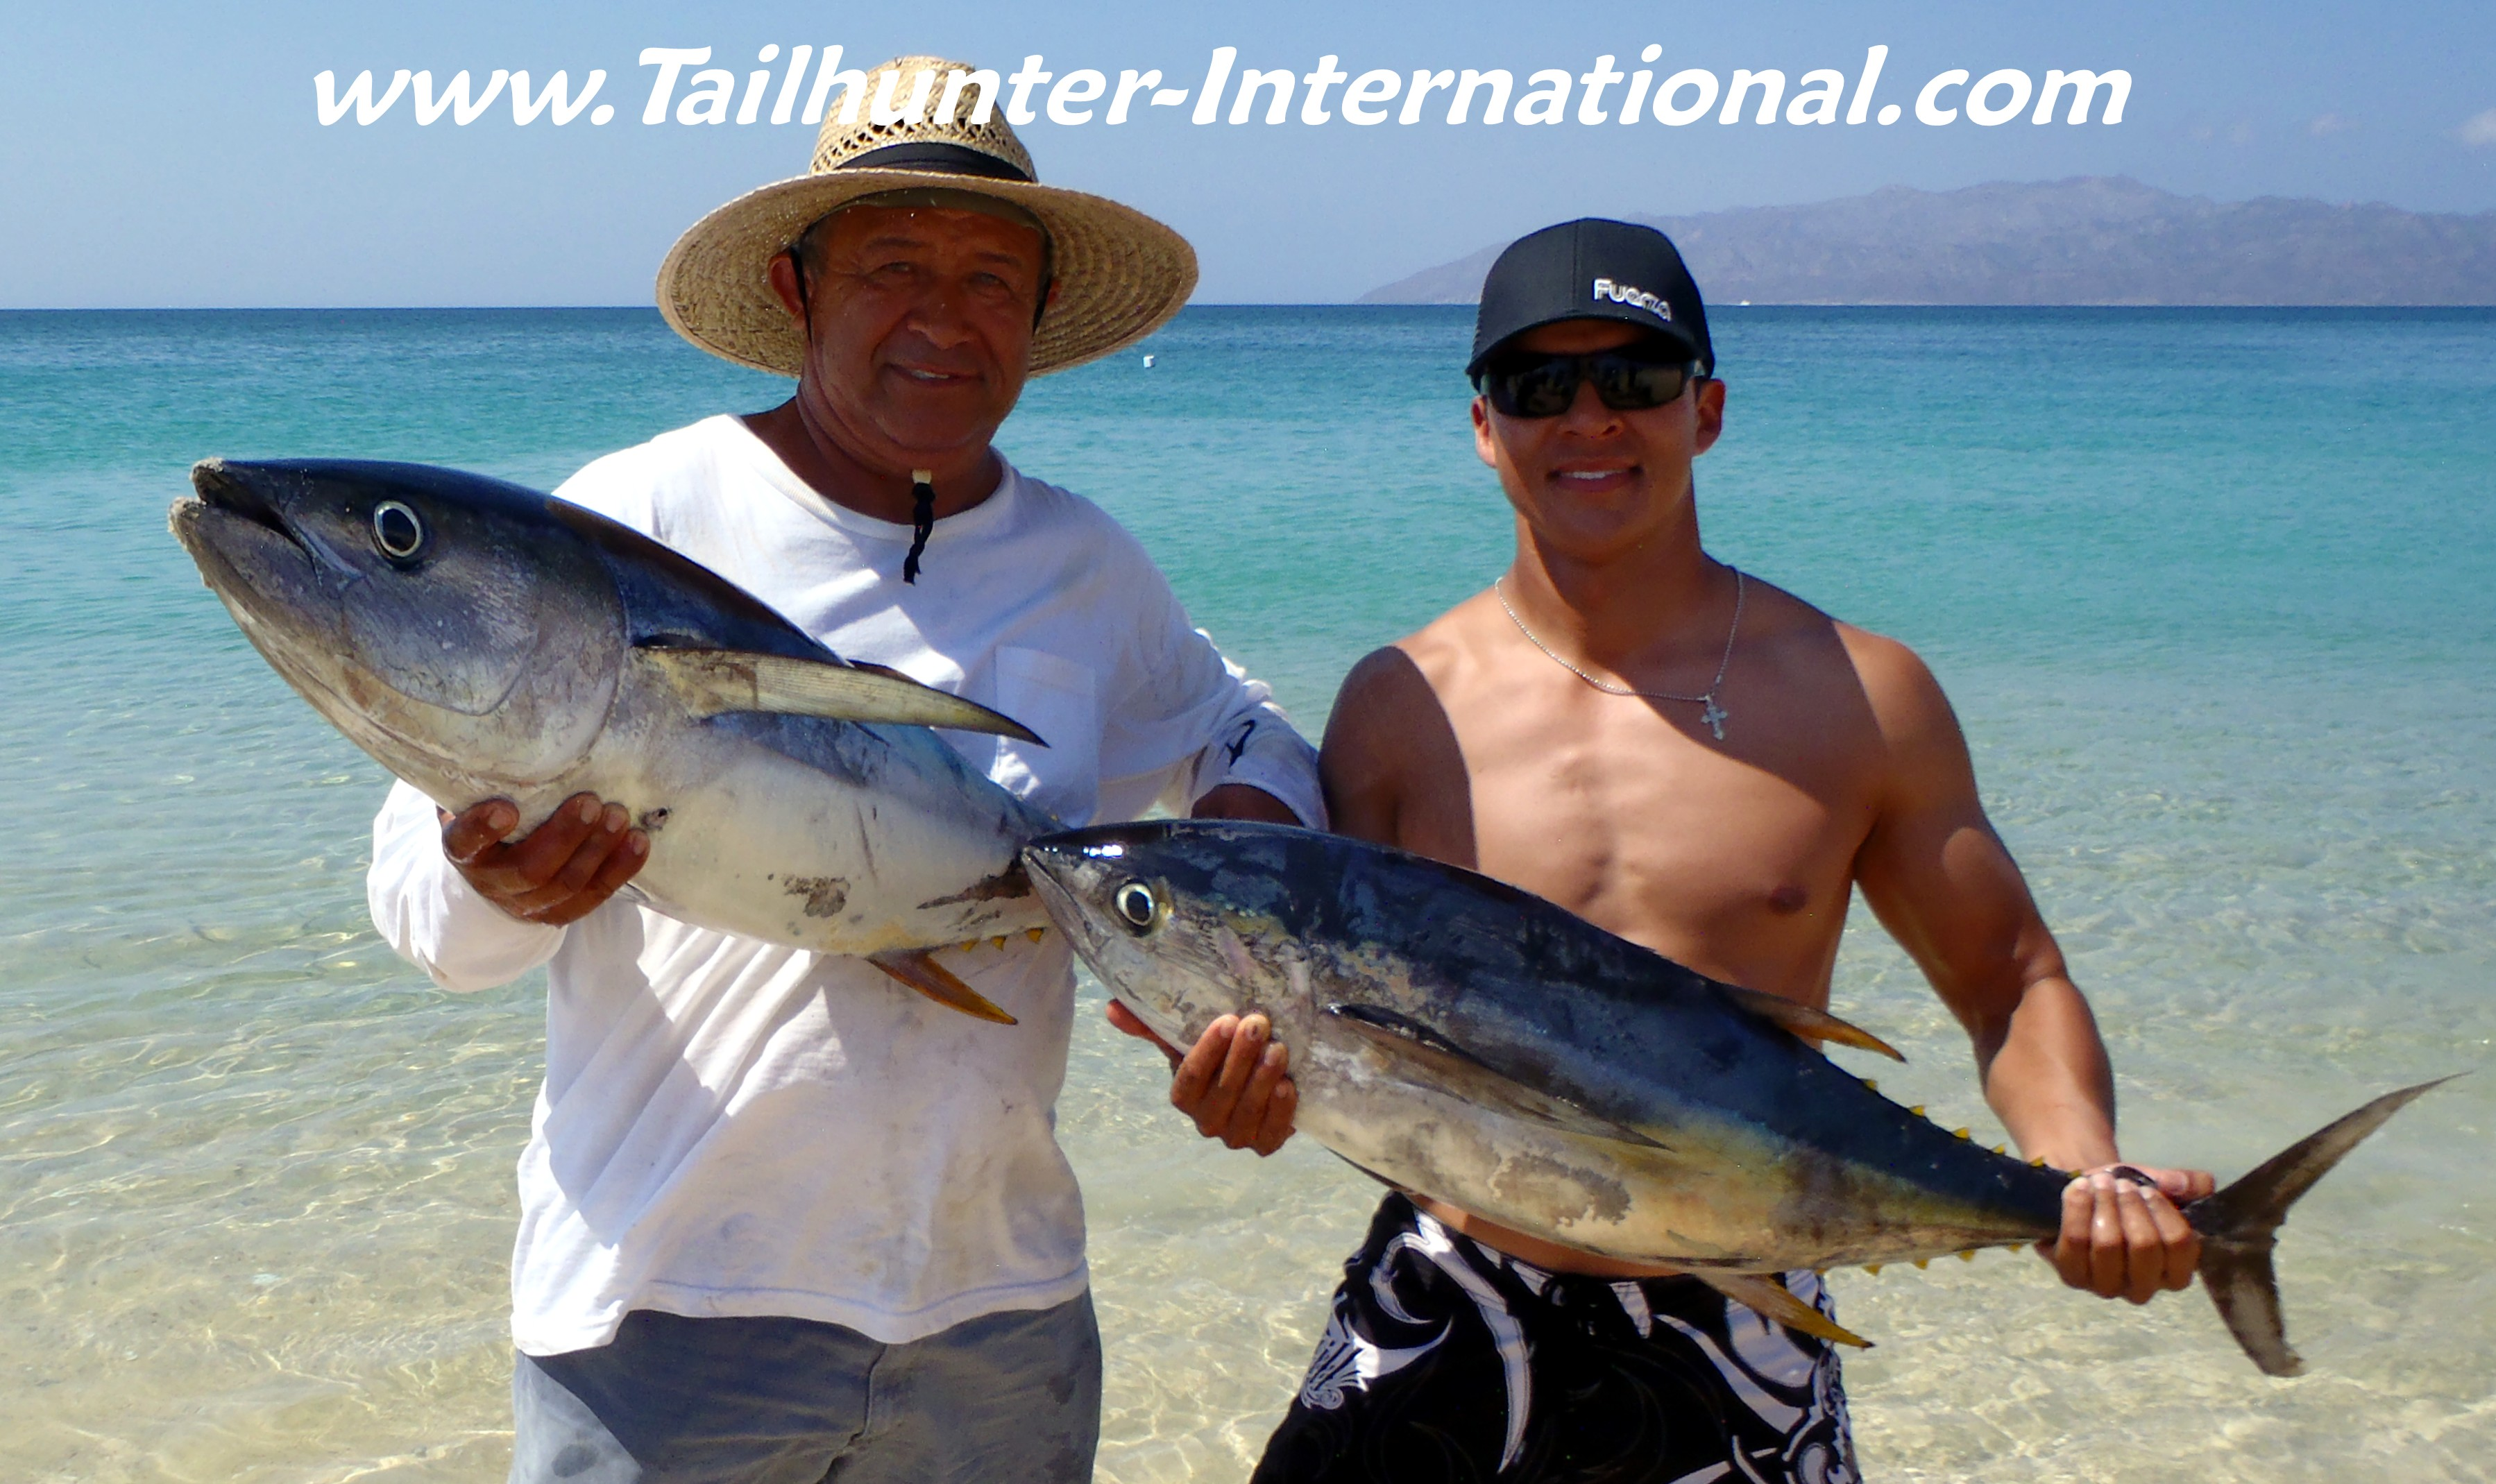 La paz las arenas report sept 4 11 39 11 for Tuna fishing show